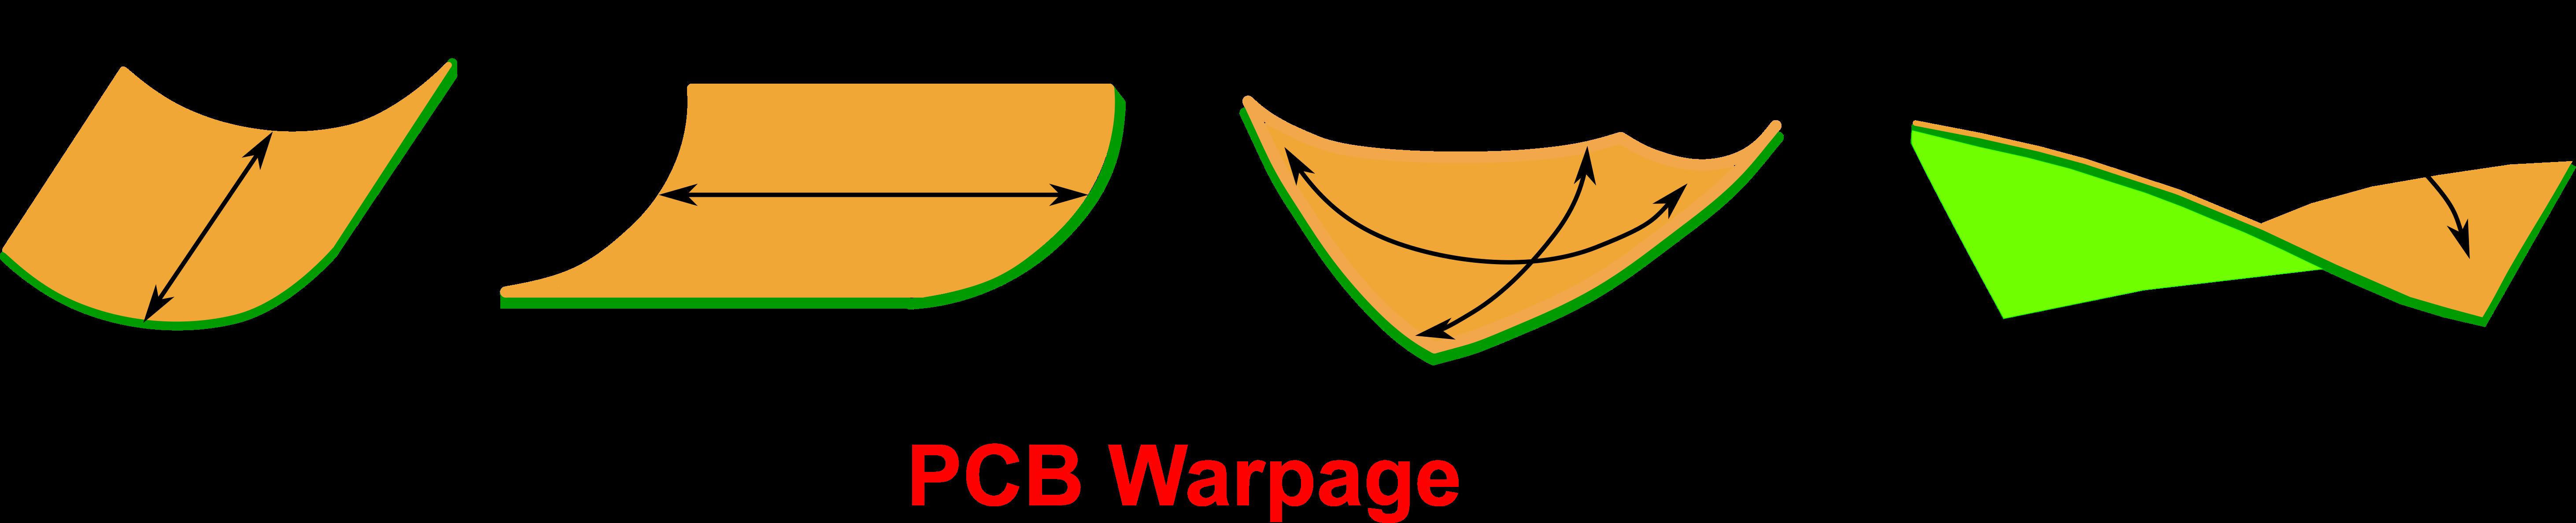 PCB warpage